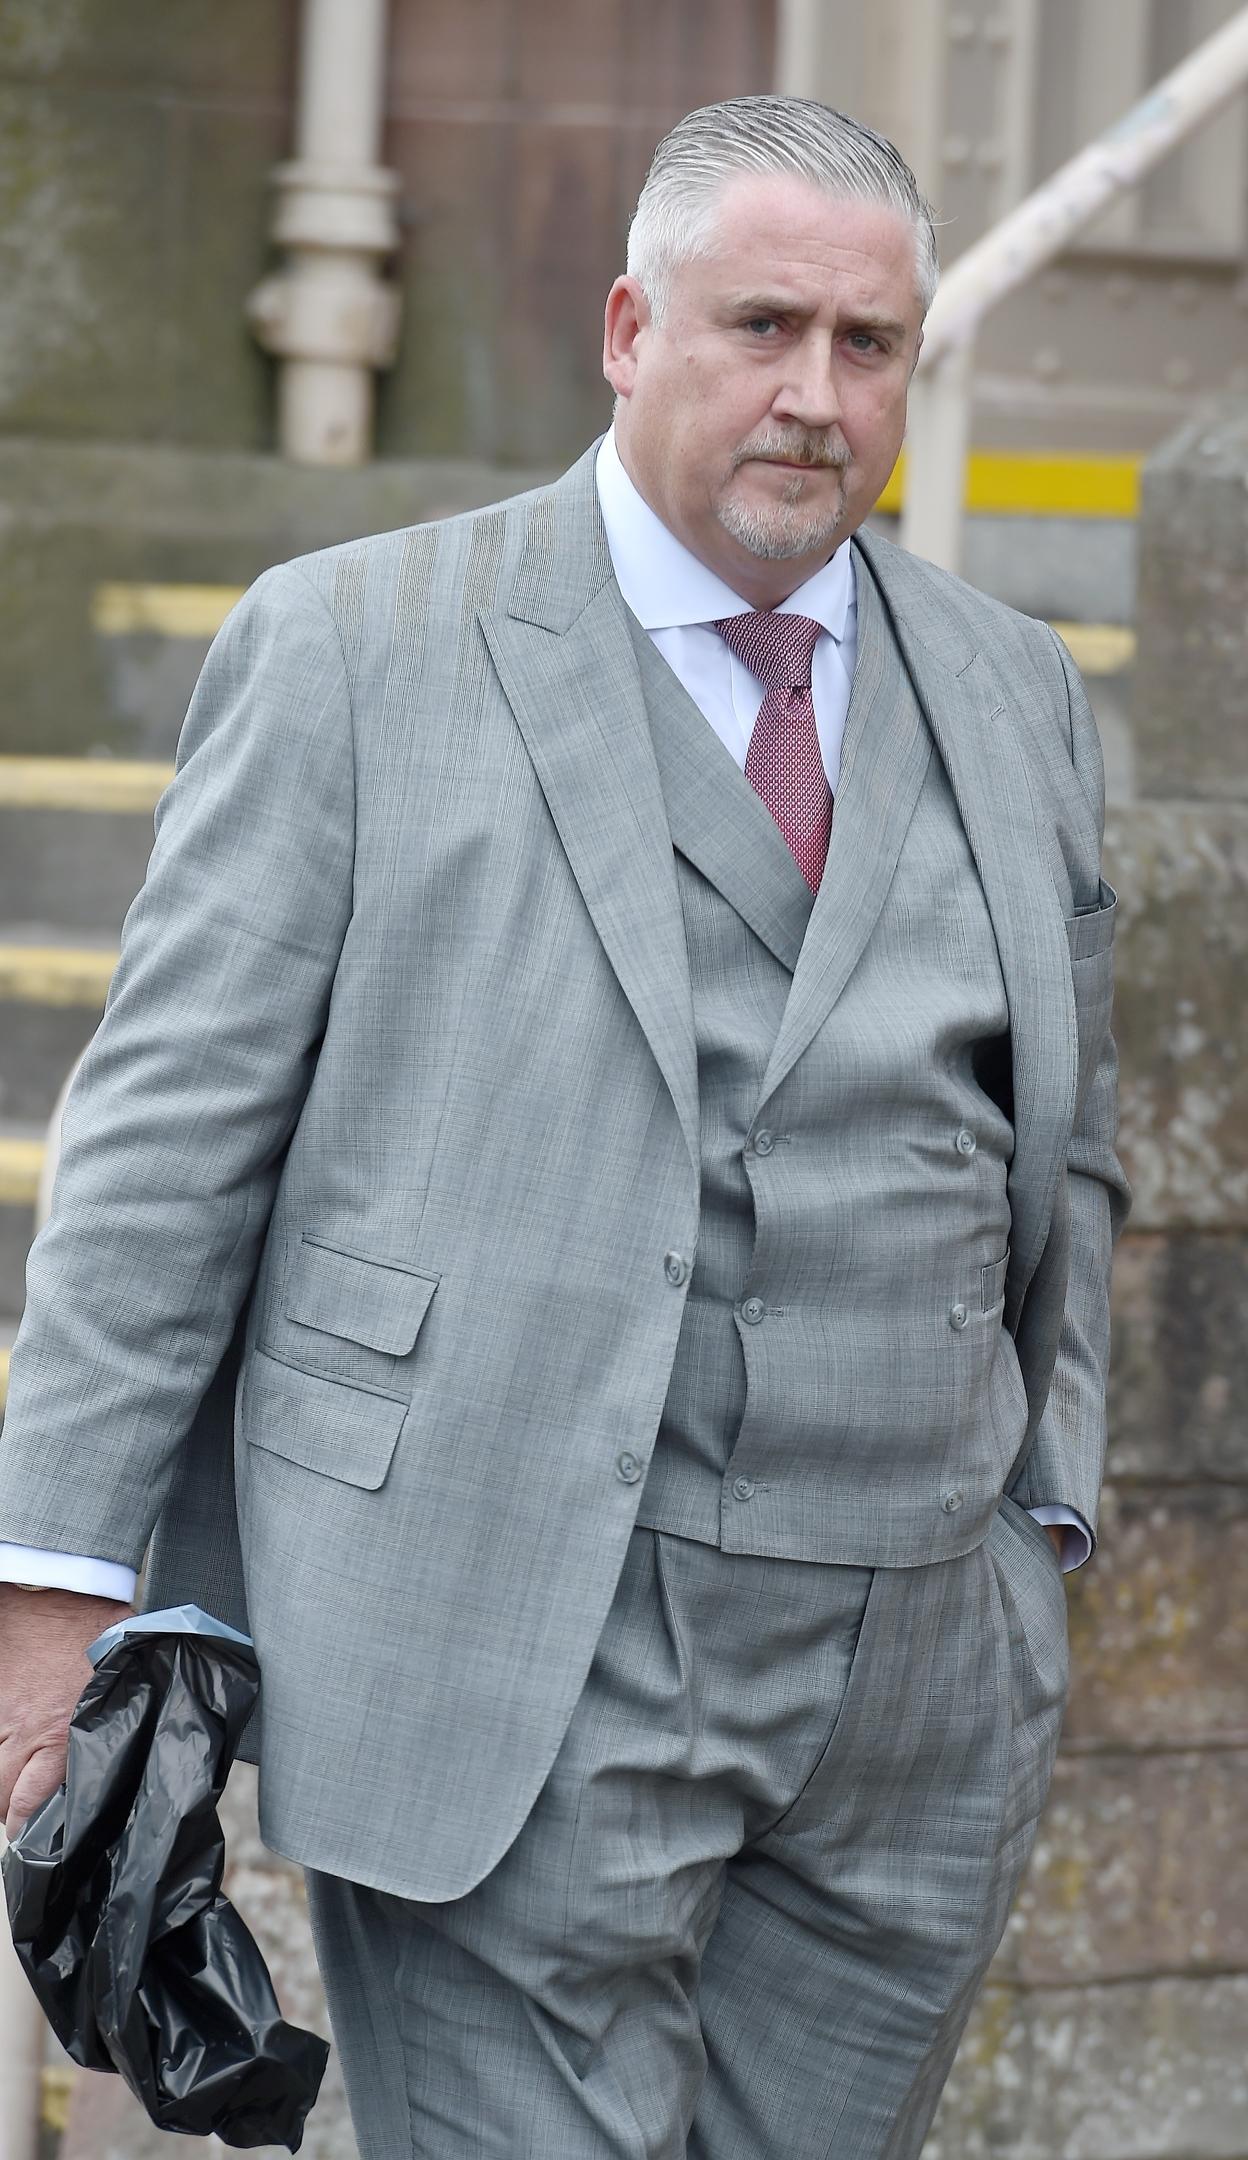 Alleged victim Paul Curran